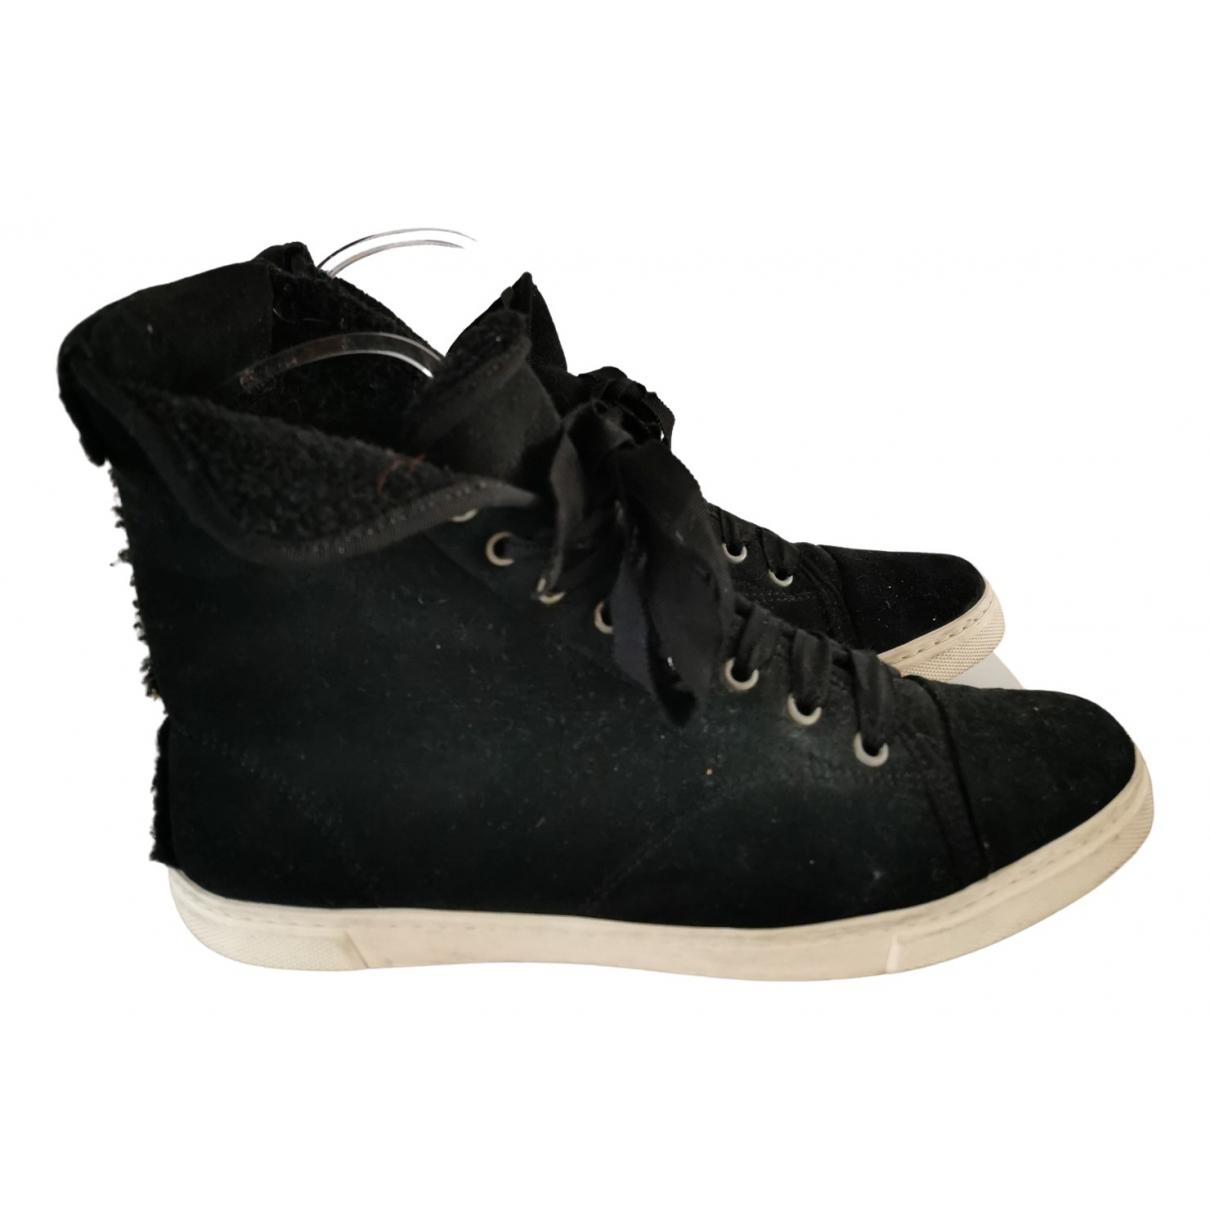 Lanvin \N Sneakers in  Schwarz Schaf